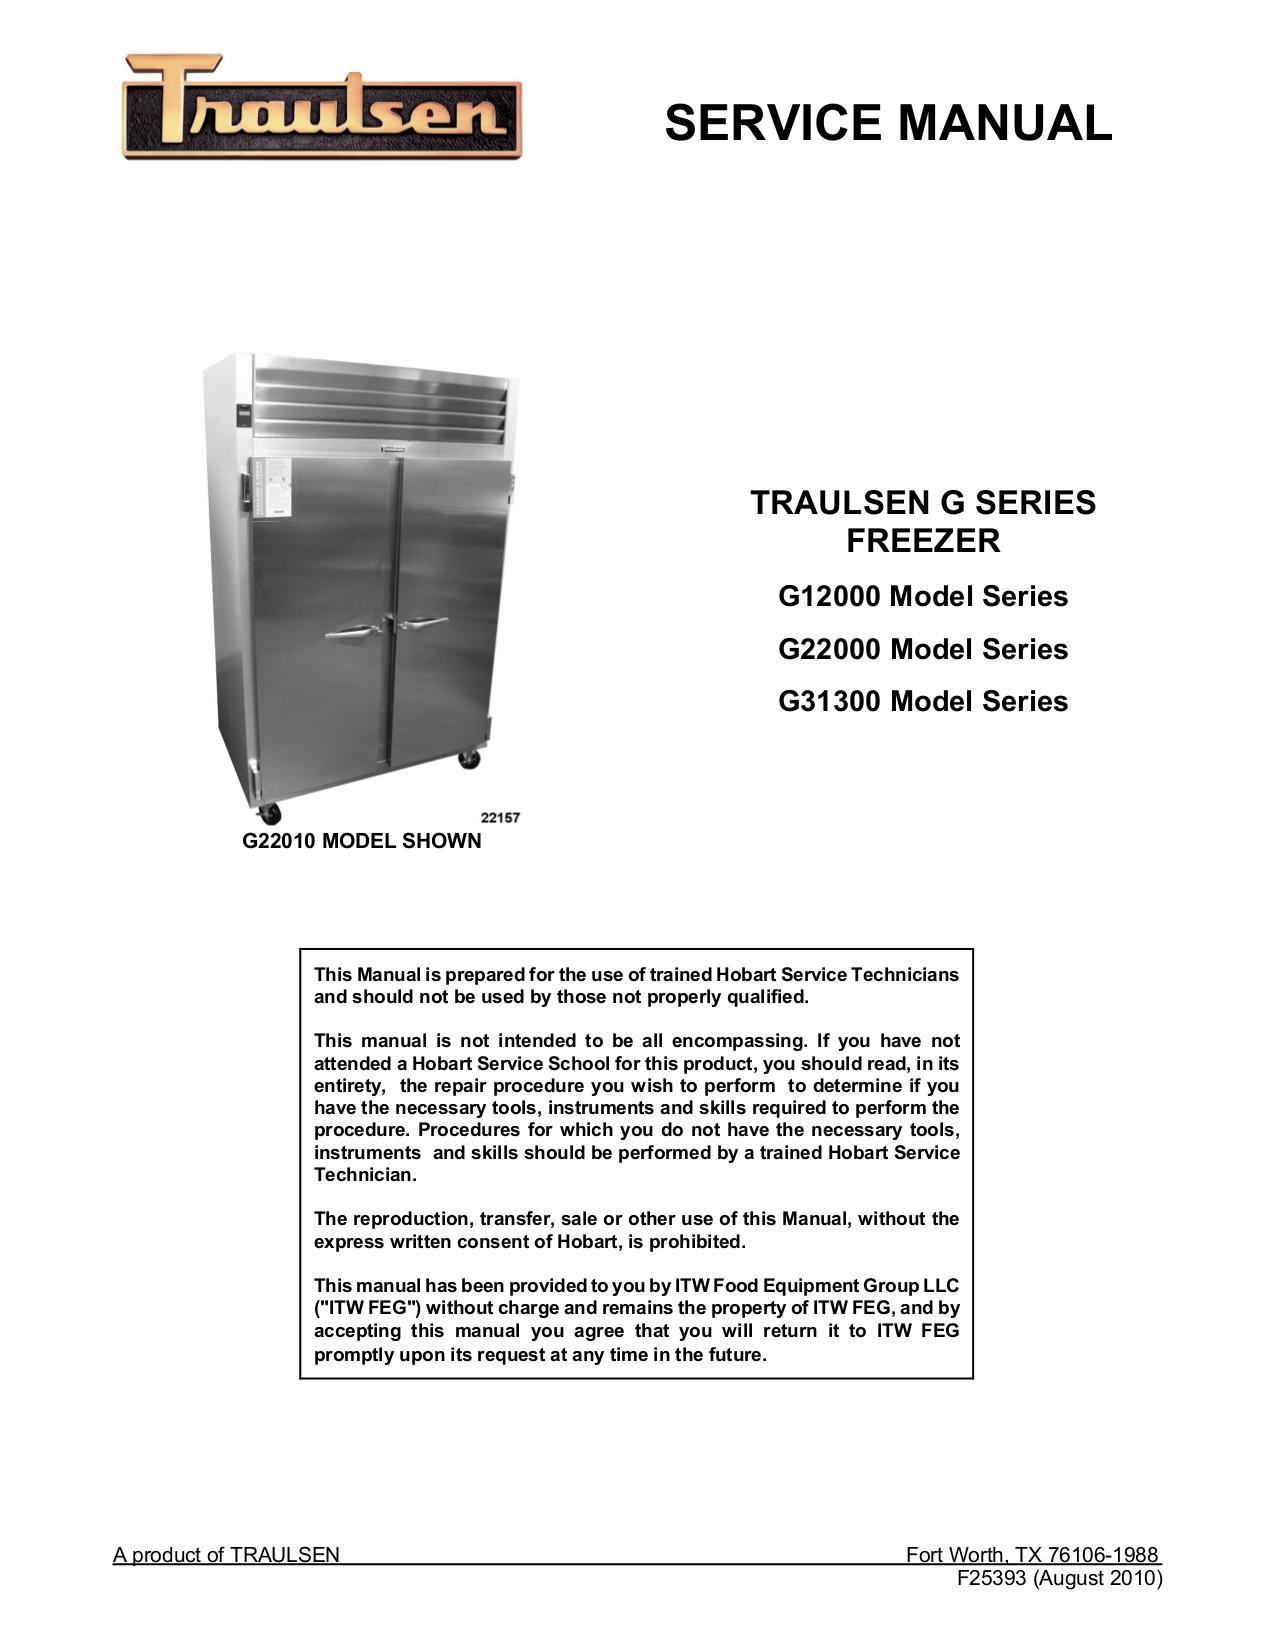 Traulsen g31010 wiring diagram model basic guide wiring diagram download free pdf for traulsen g31300 freezer manual rh umlib com bohn refrigeration wiring diagrams traulsen cheapraybanclubmaster Gallery